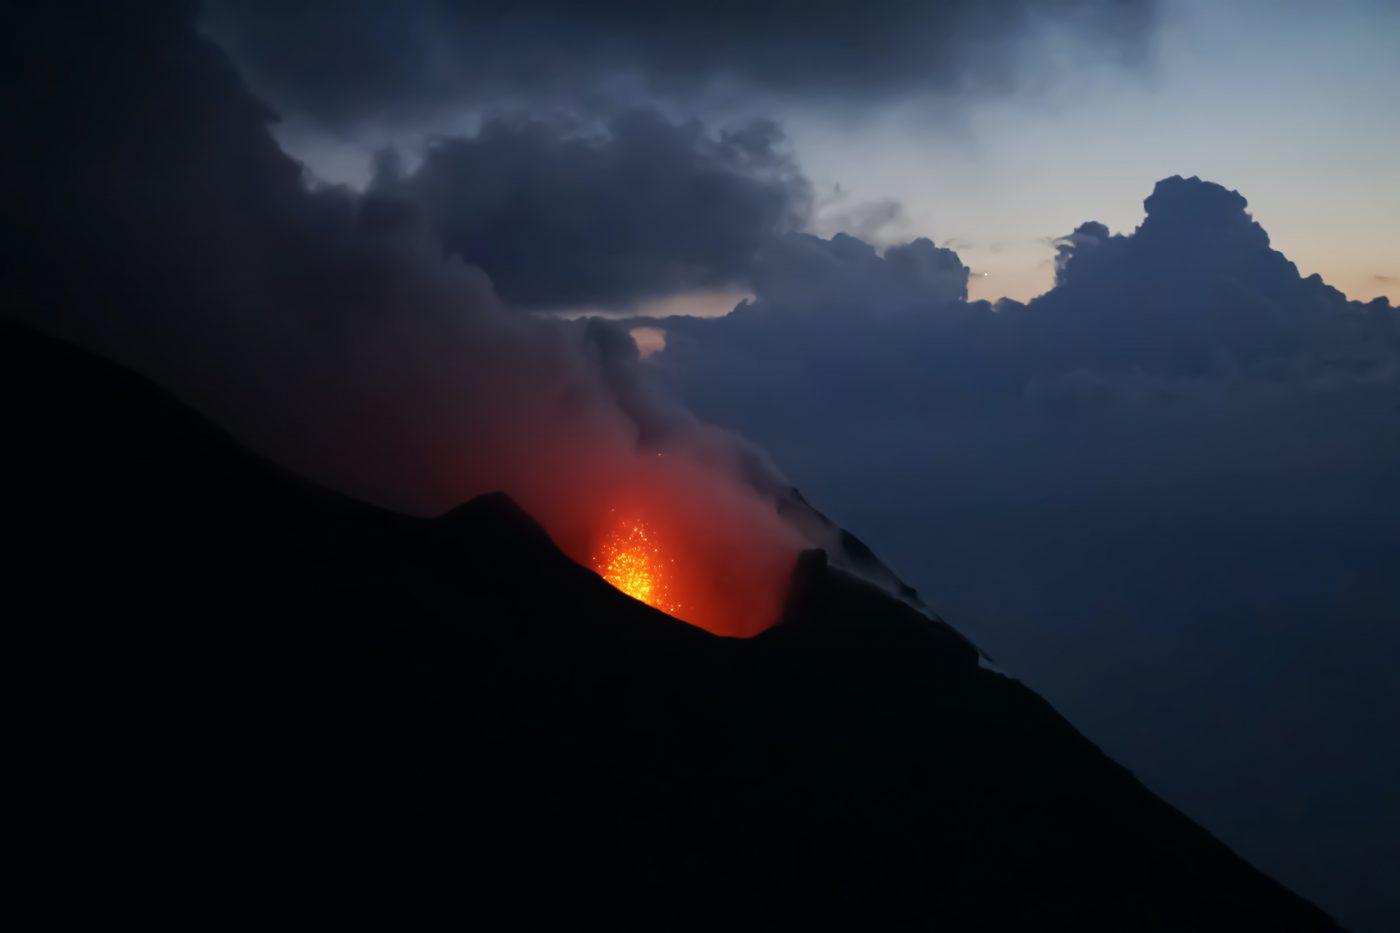 Volcano Stromboli Island - Sicilia